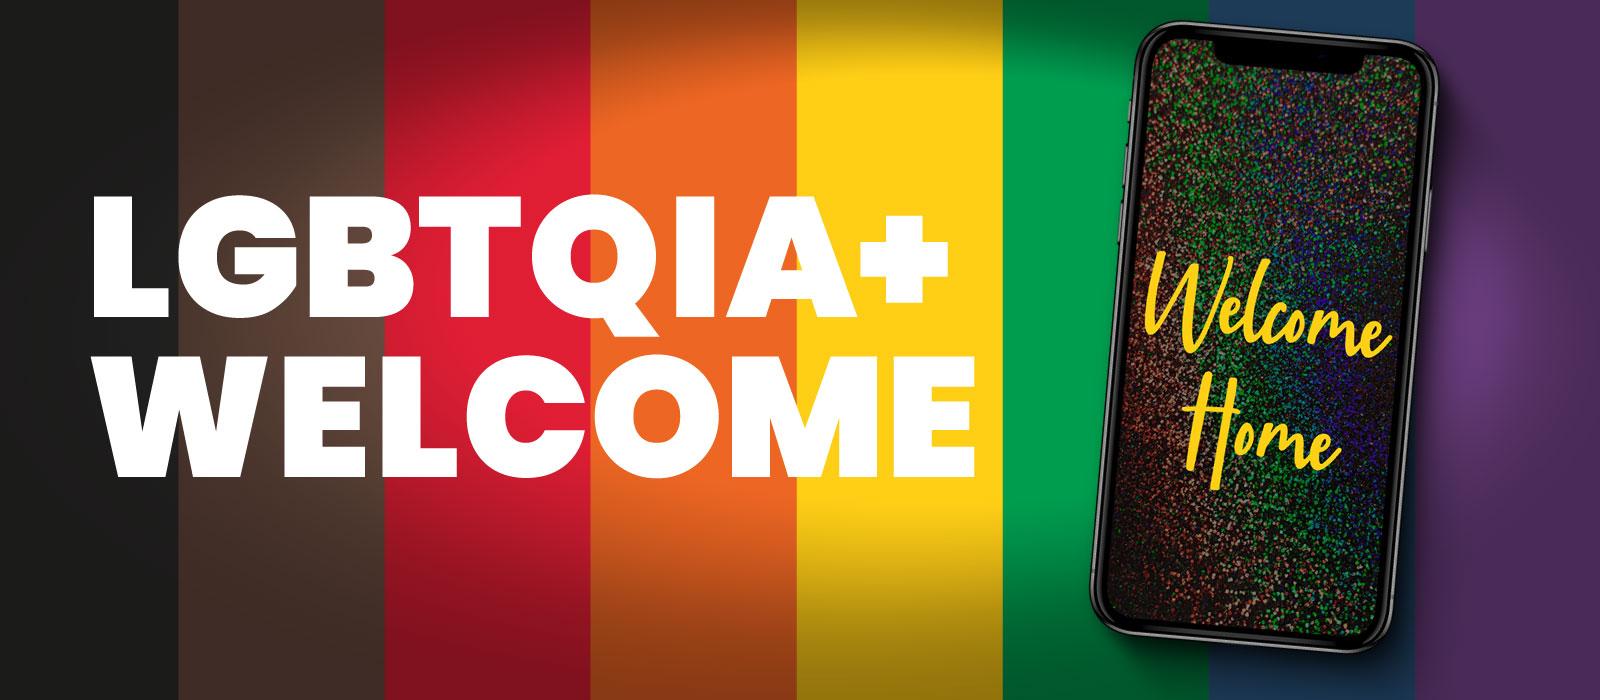 SJE_LGBTQIAWelcome_Web-Banner_1600x700px